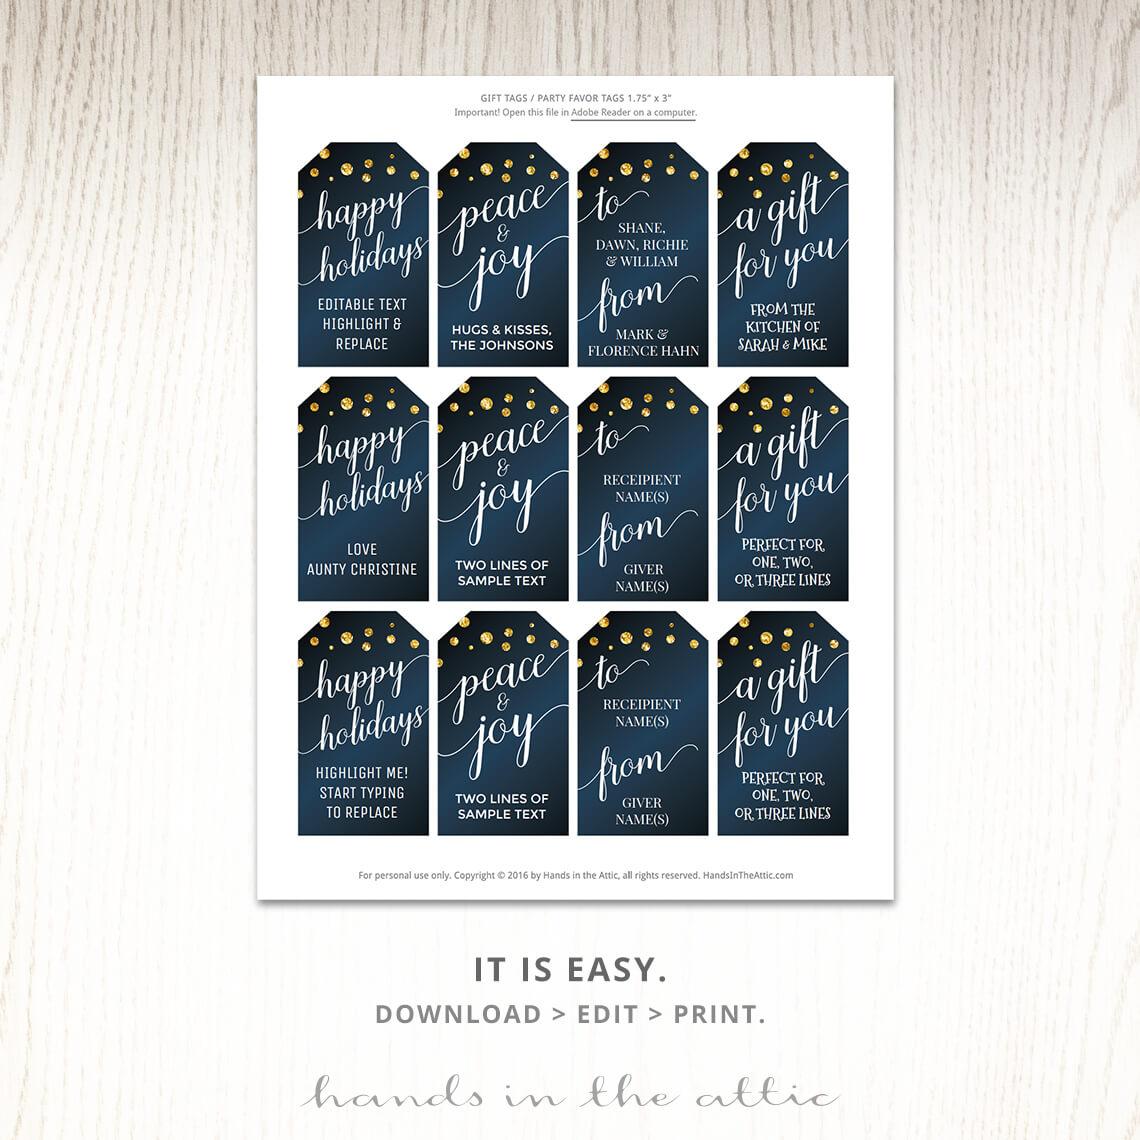 Printable Wedding Invitations Kits